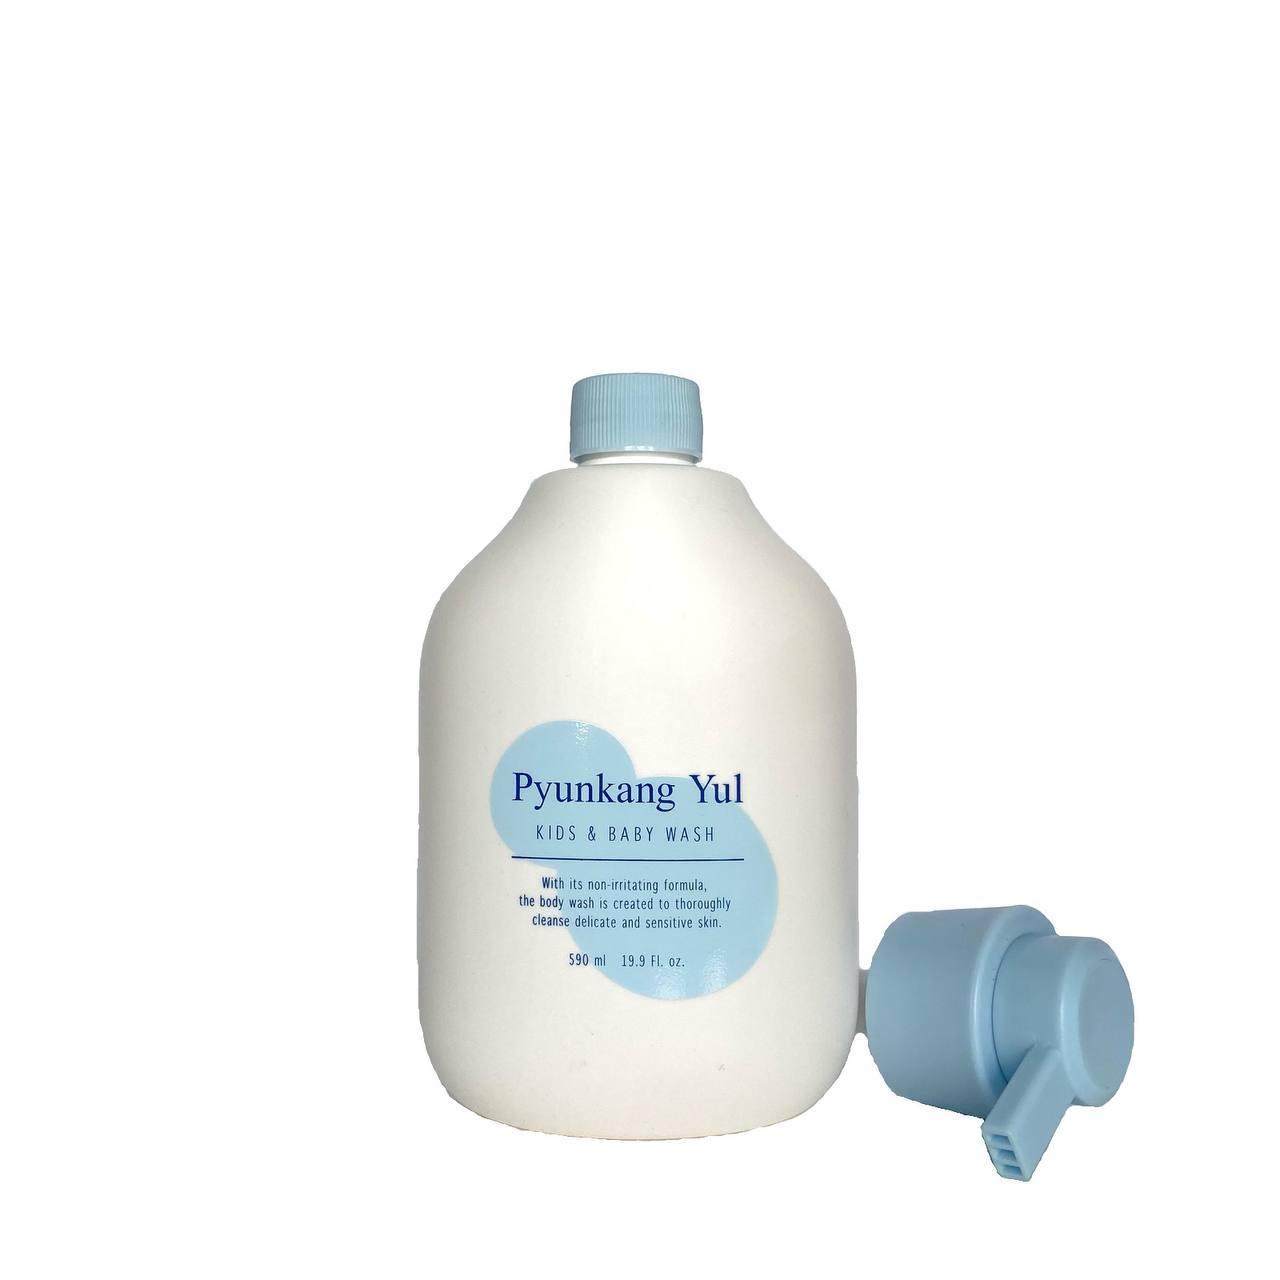 Гель для душа детский Pyunkang Yul Kids & Baby Wash 590 мл